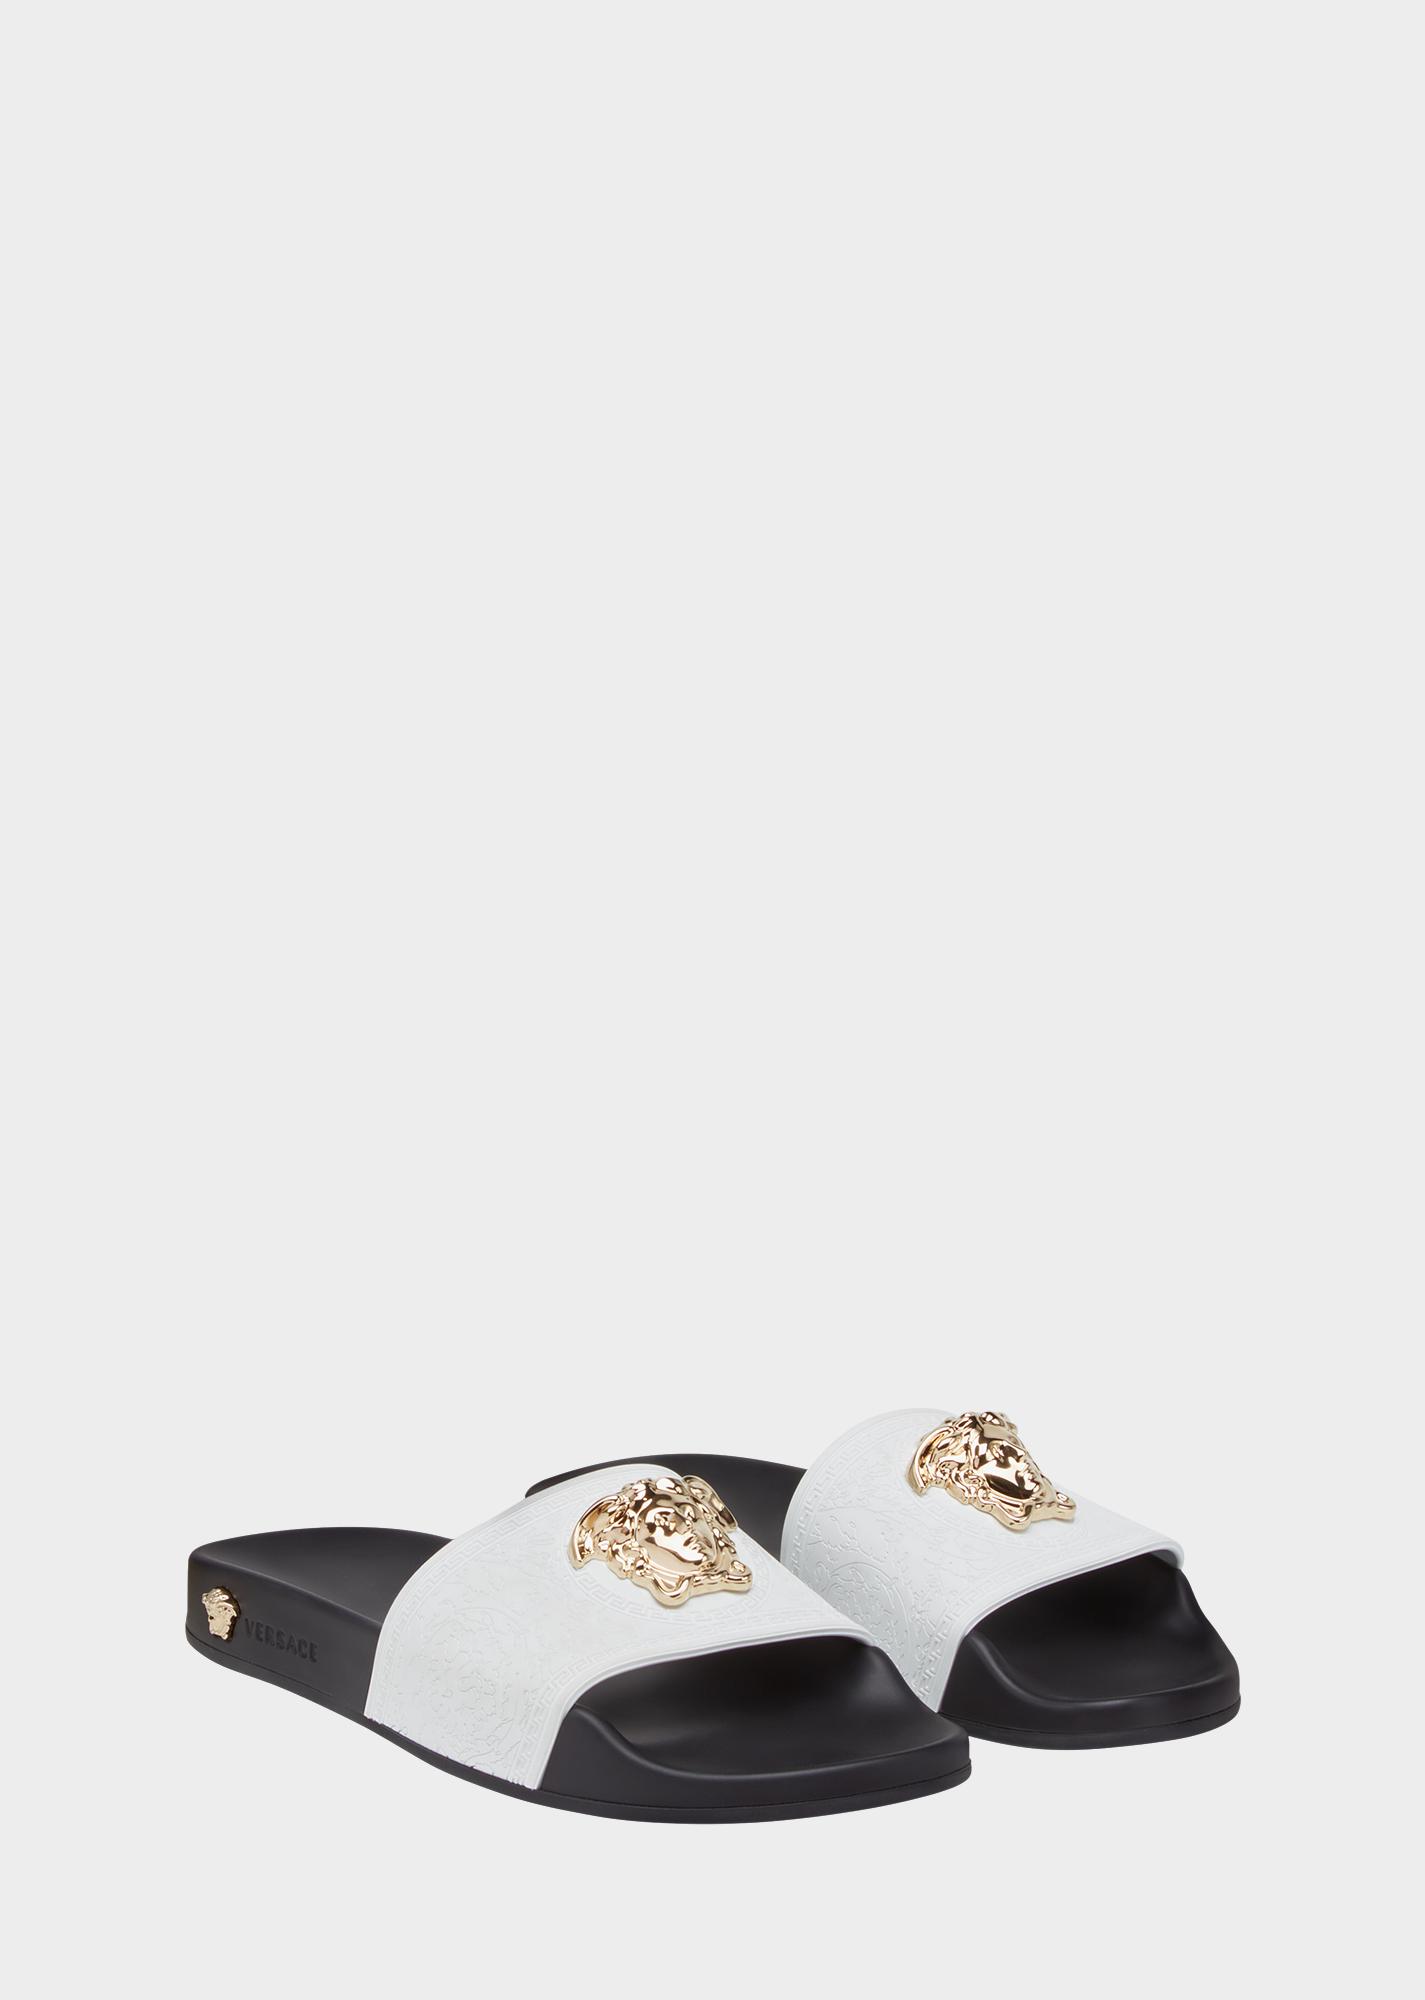 828d3170e0 Medusa Head Mules for Women | US Online Store in 2019 | Shoesss ...